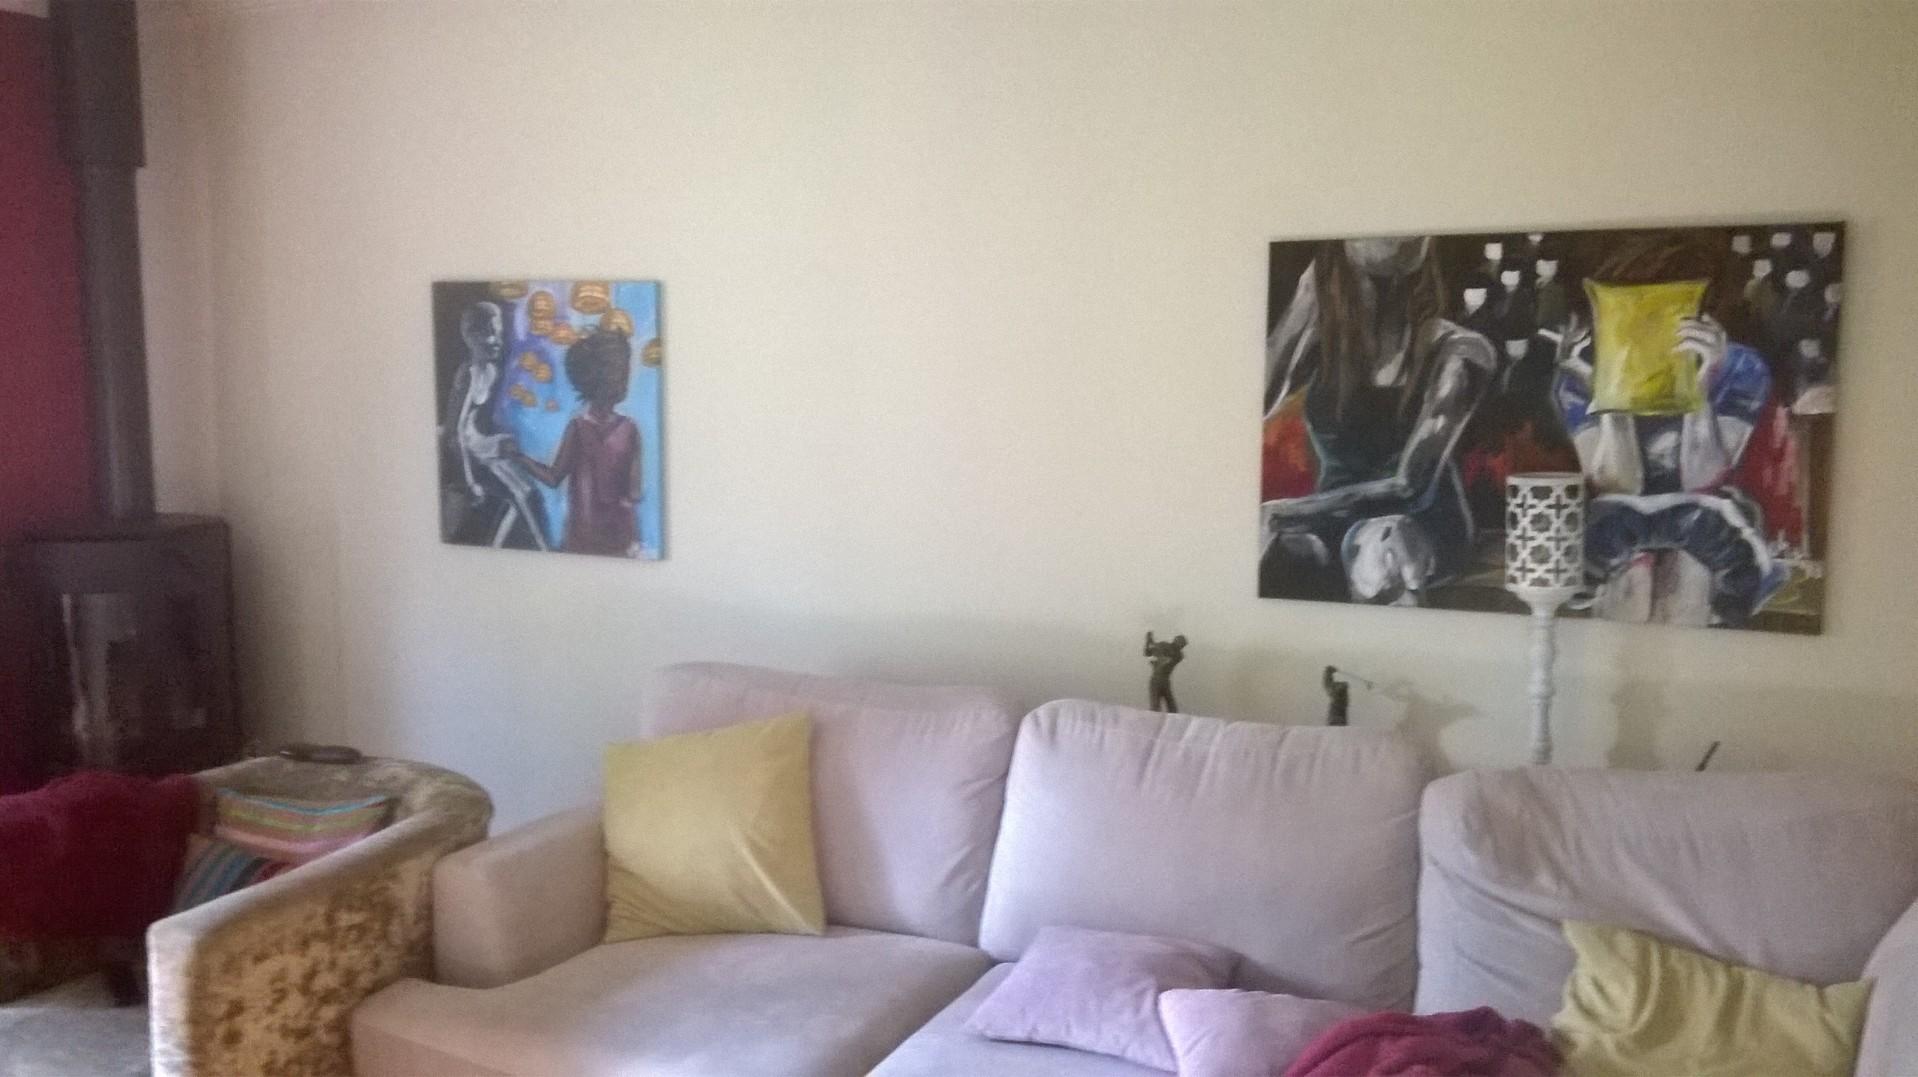 Paintings_Melanie Franz